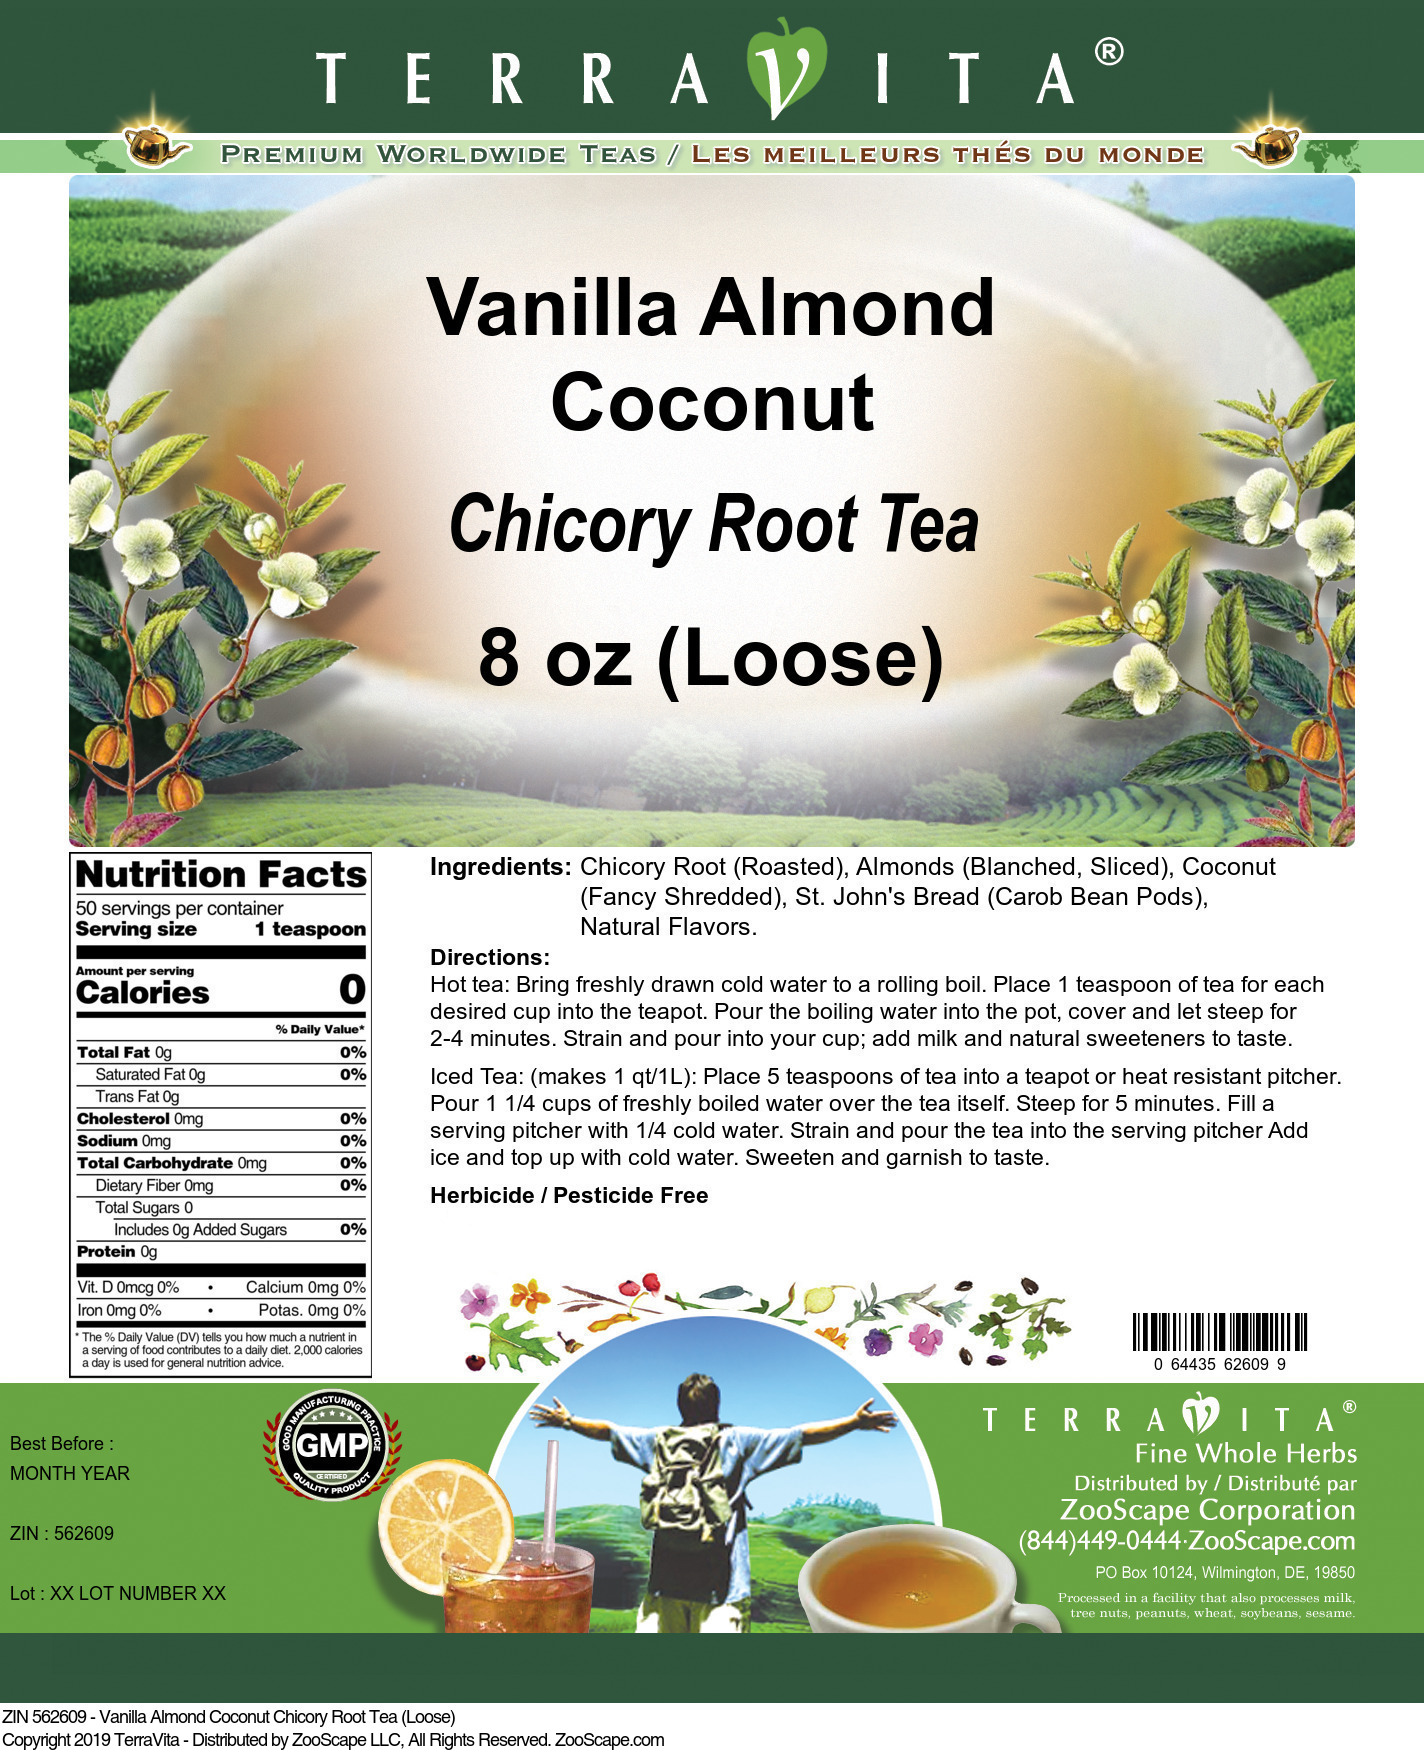 Vanilla Almond Coconut Chicory Root Tea (Loose)